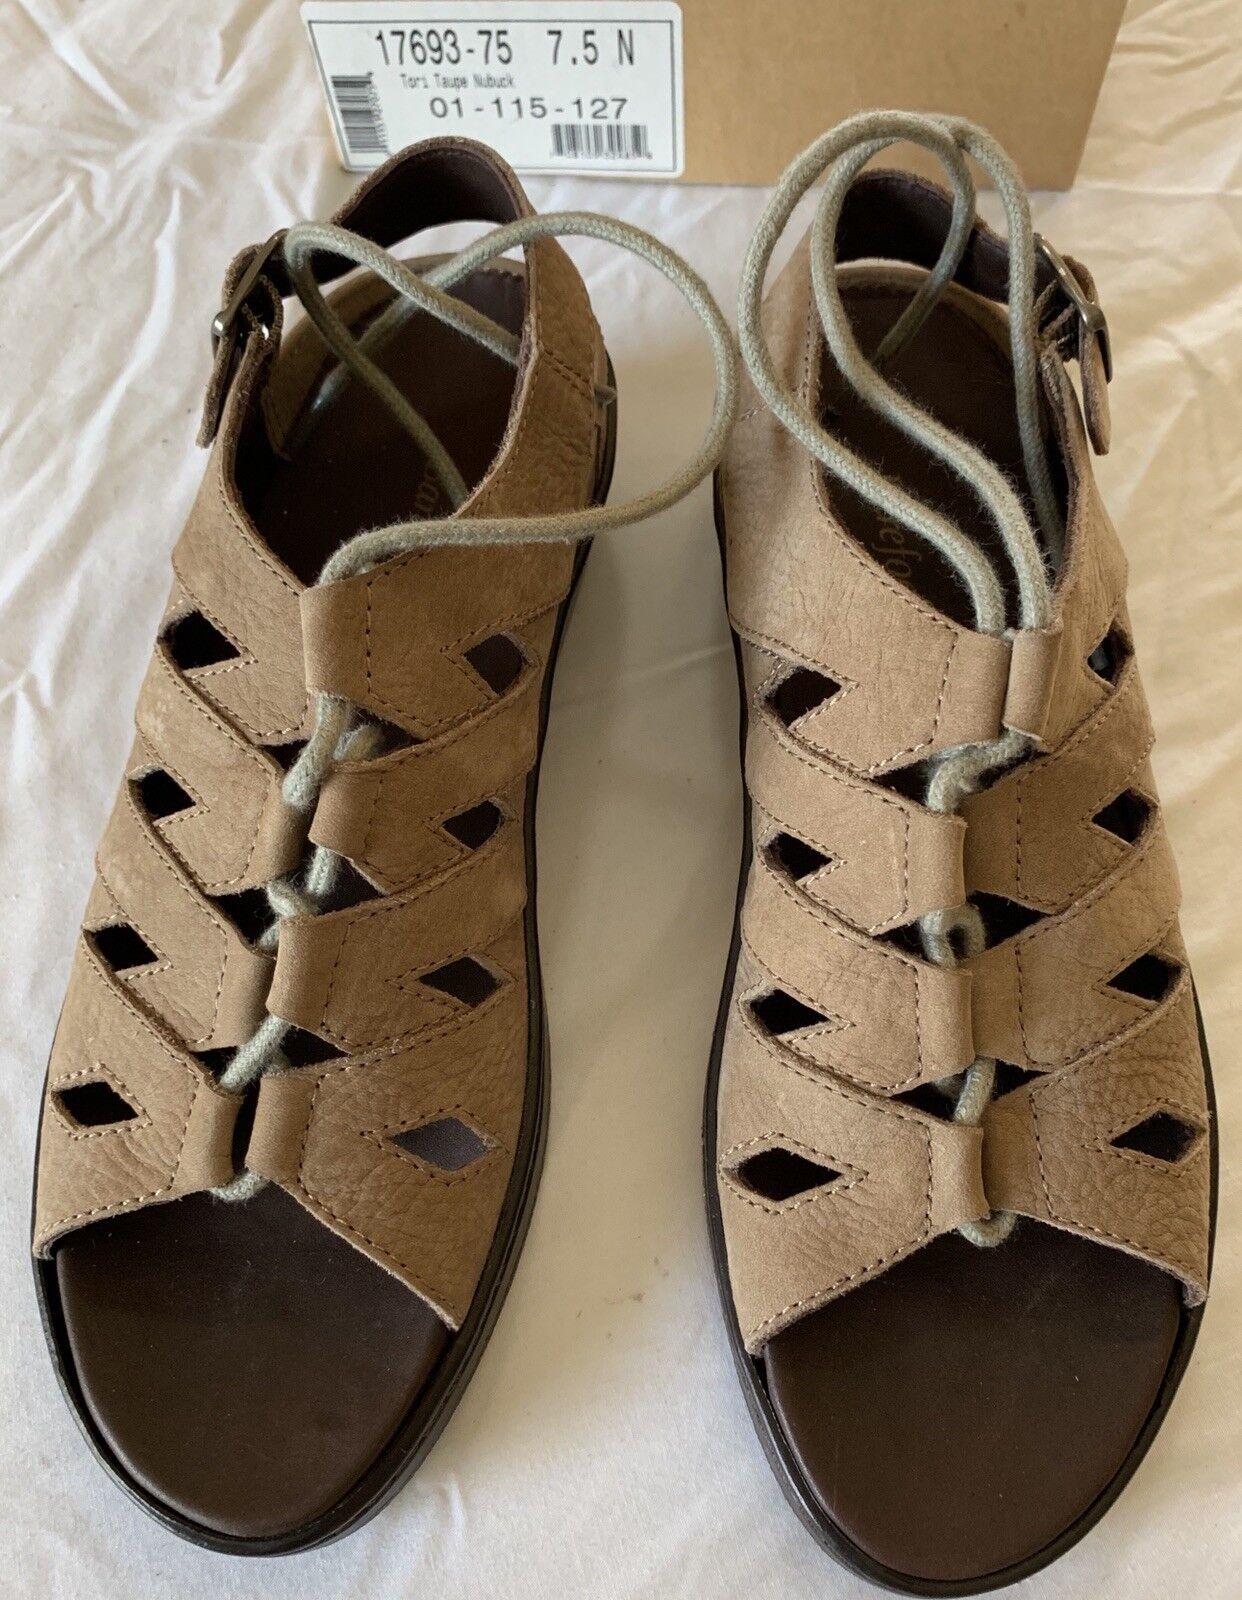 Sandalias para mujer bcasual chatarra Drew Zapato, Tori Tori Tori Marrón Topo Nubuck 7.5 n vuelve libre  para mayoristas